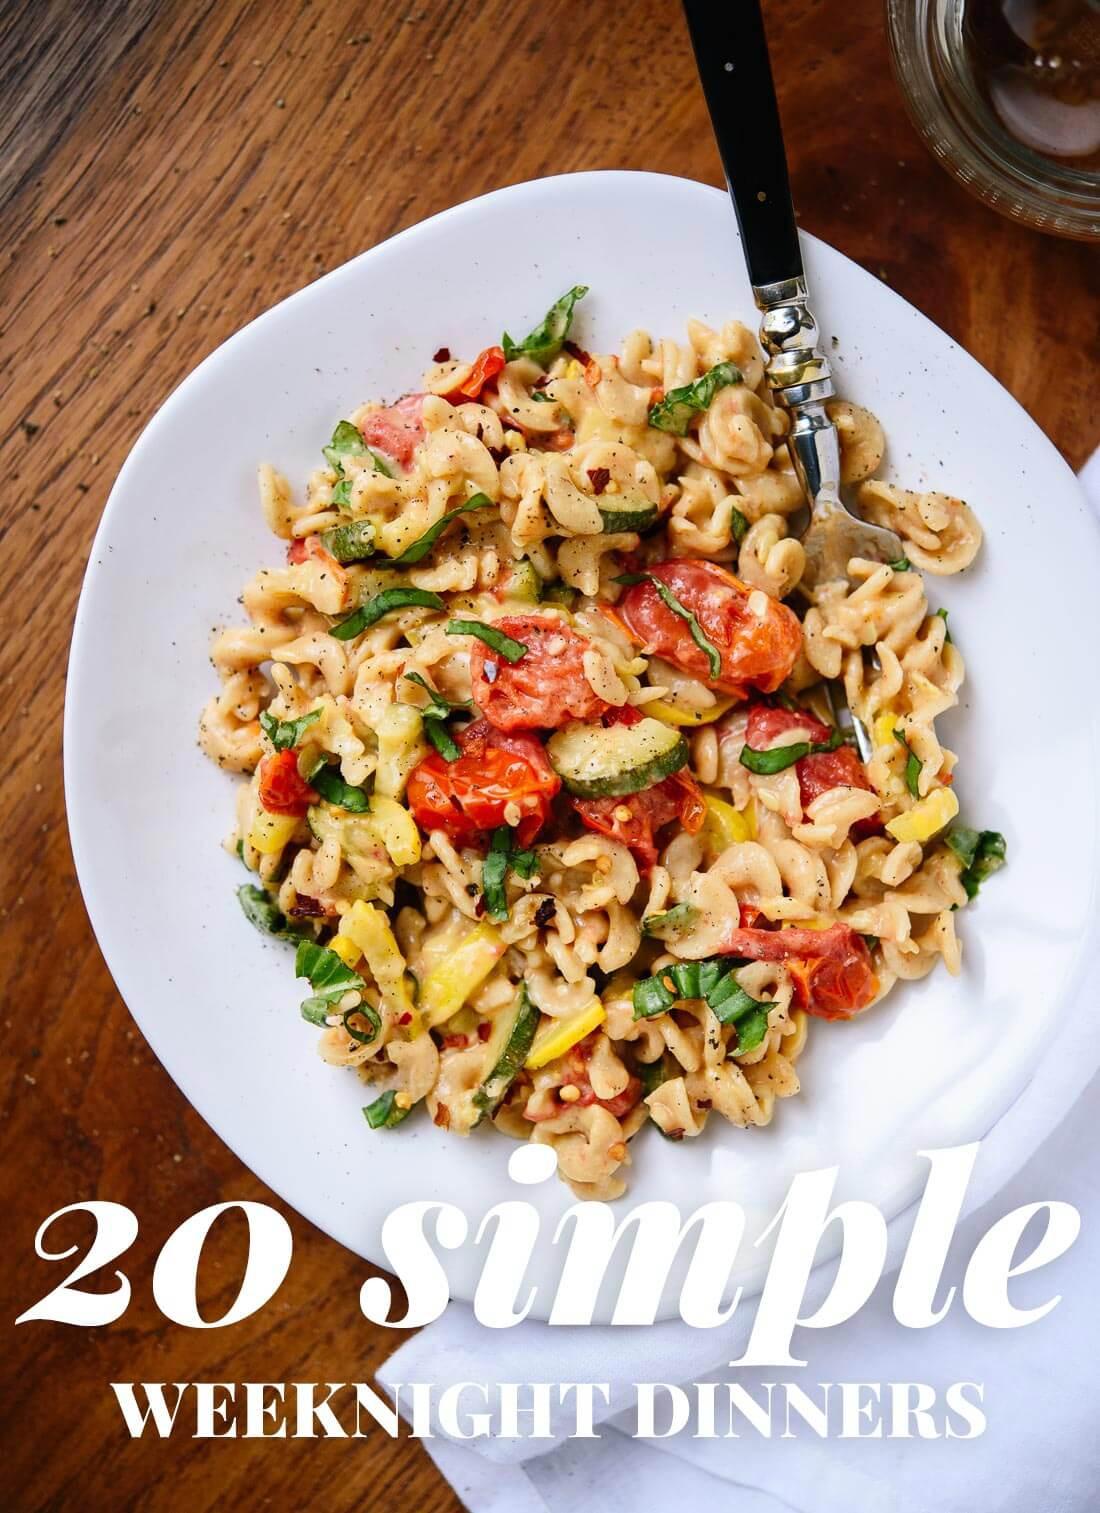 Vegetarian Dinner Ideas  20 Simple Ve arian Dinner Recipes Cookie and Kate